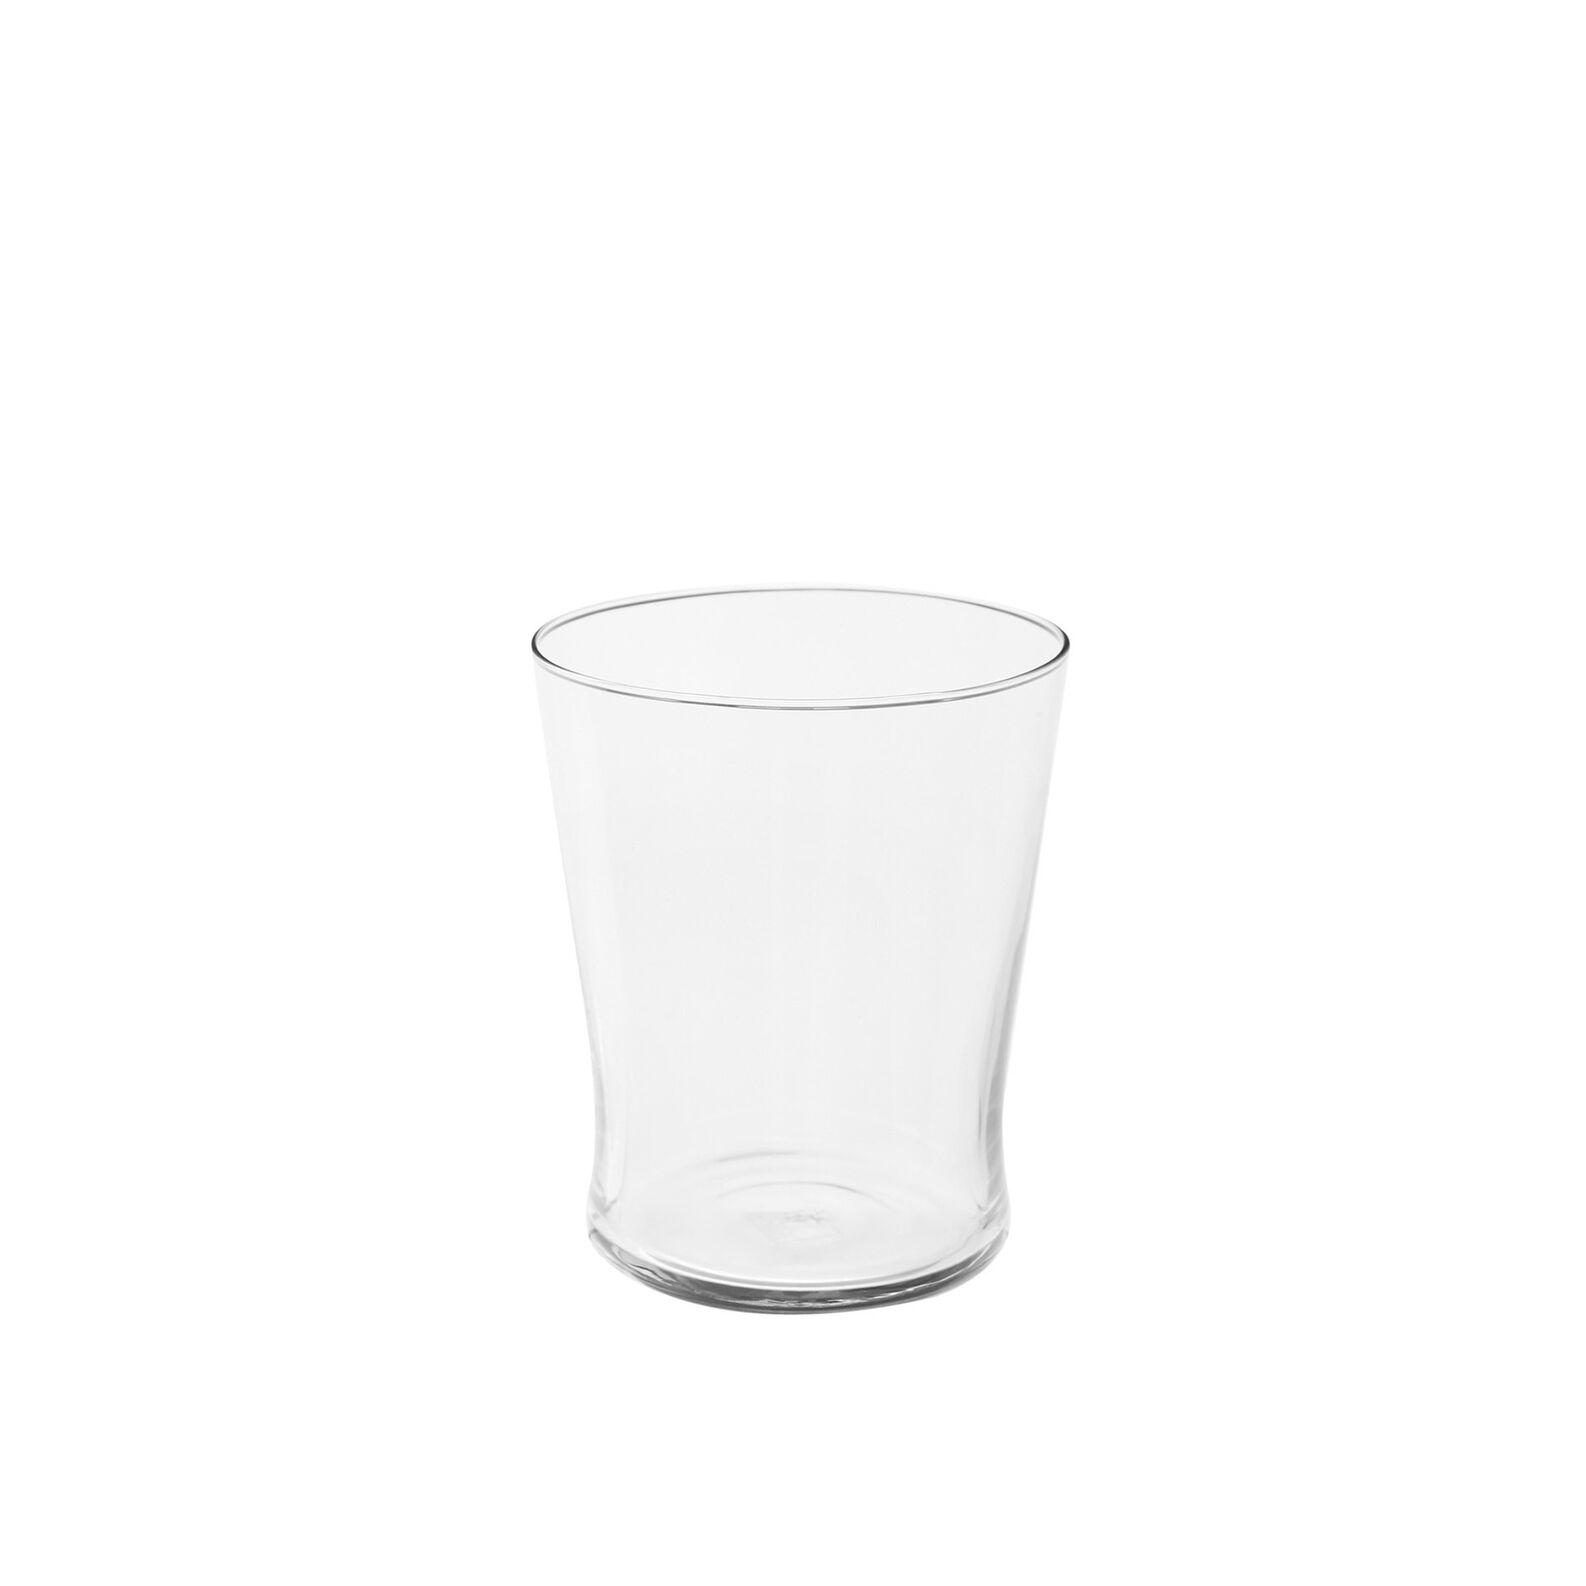 Set of 6 Conic wine glasses